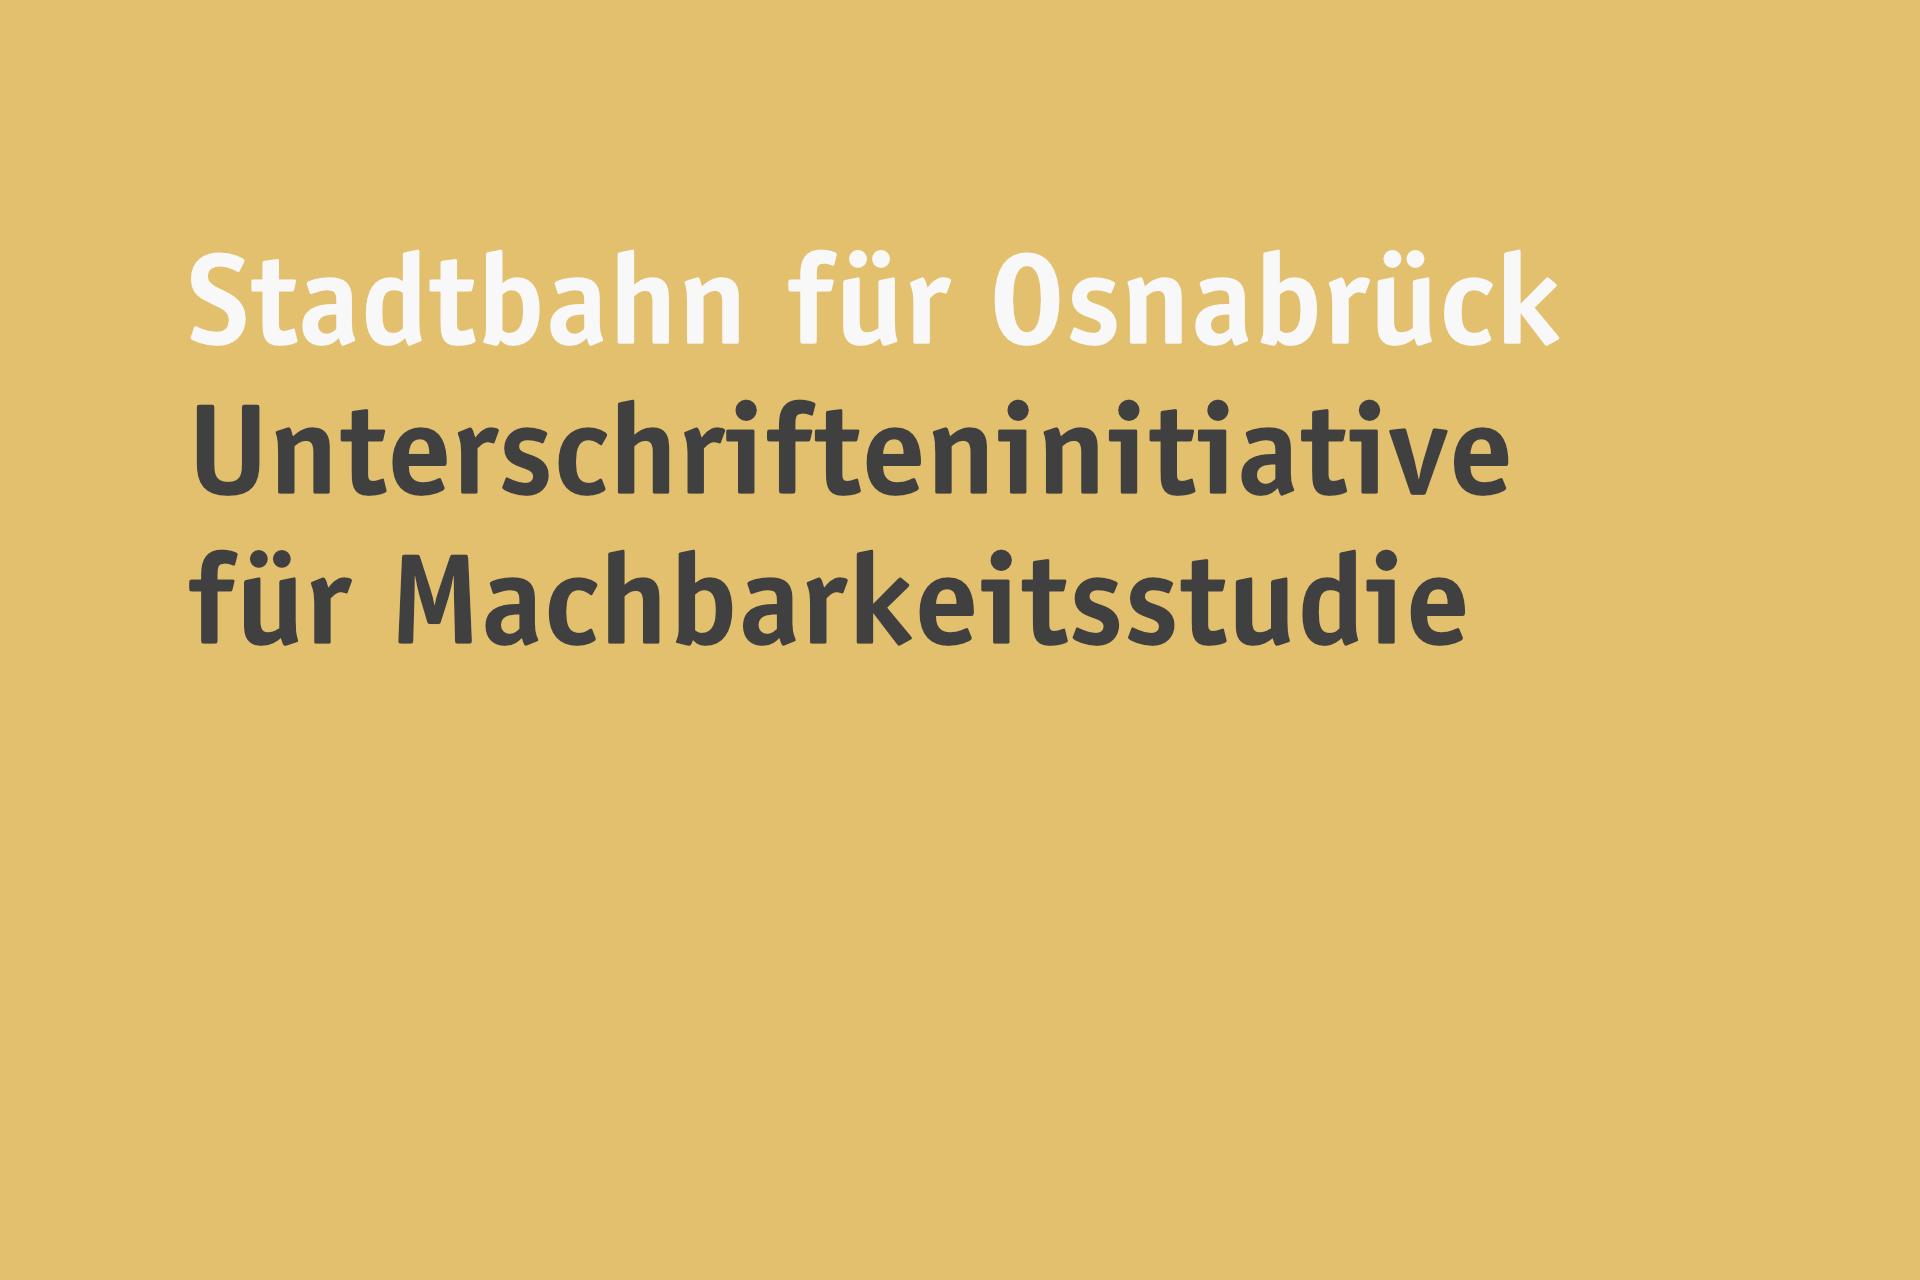 Stadtbahn für Osnabrück